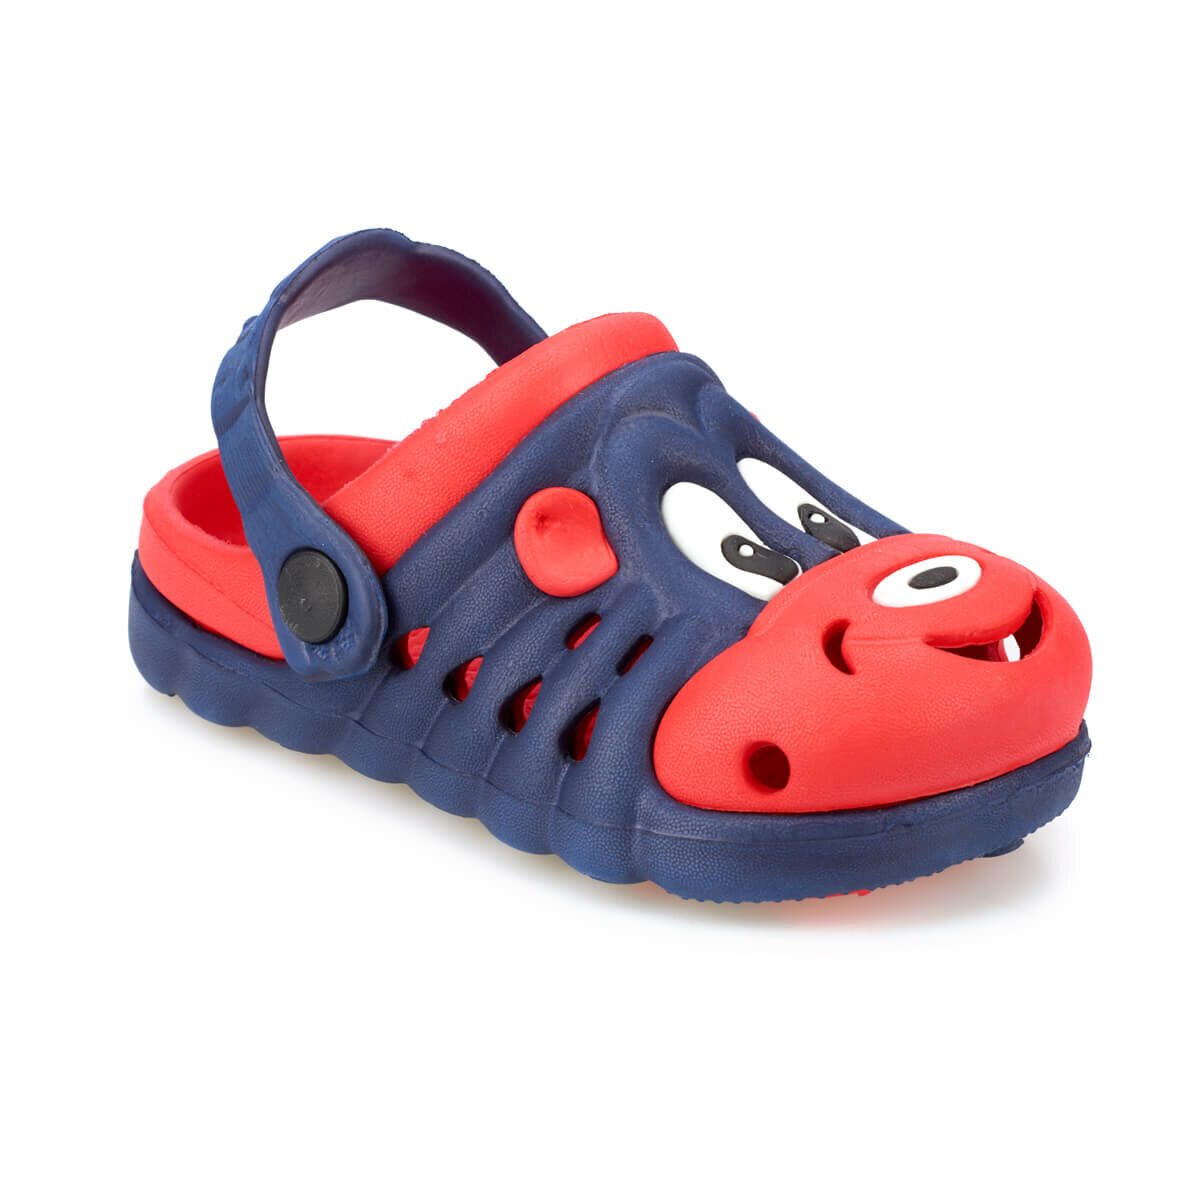 FLO DIGO Navy Blue Male Child Sea Shoes KINETIX